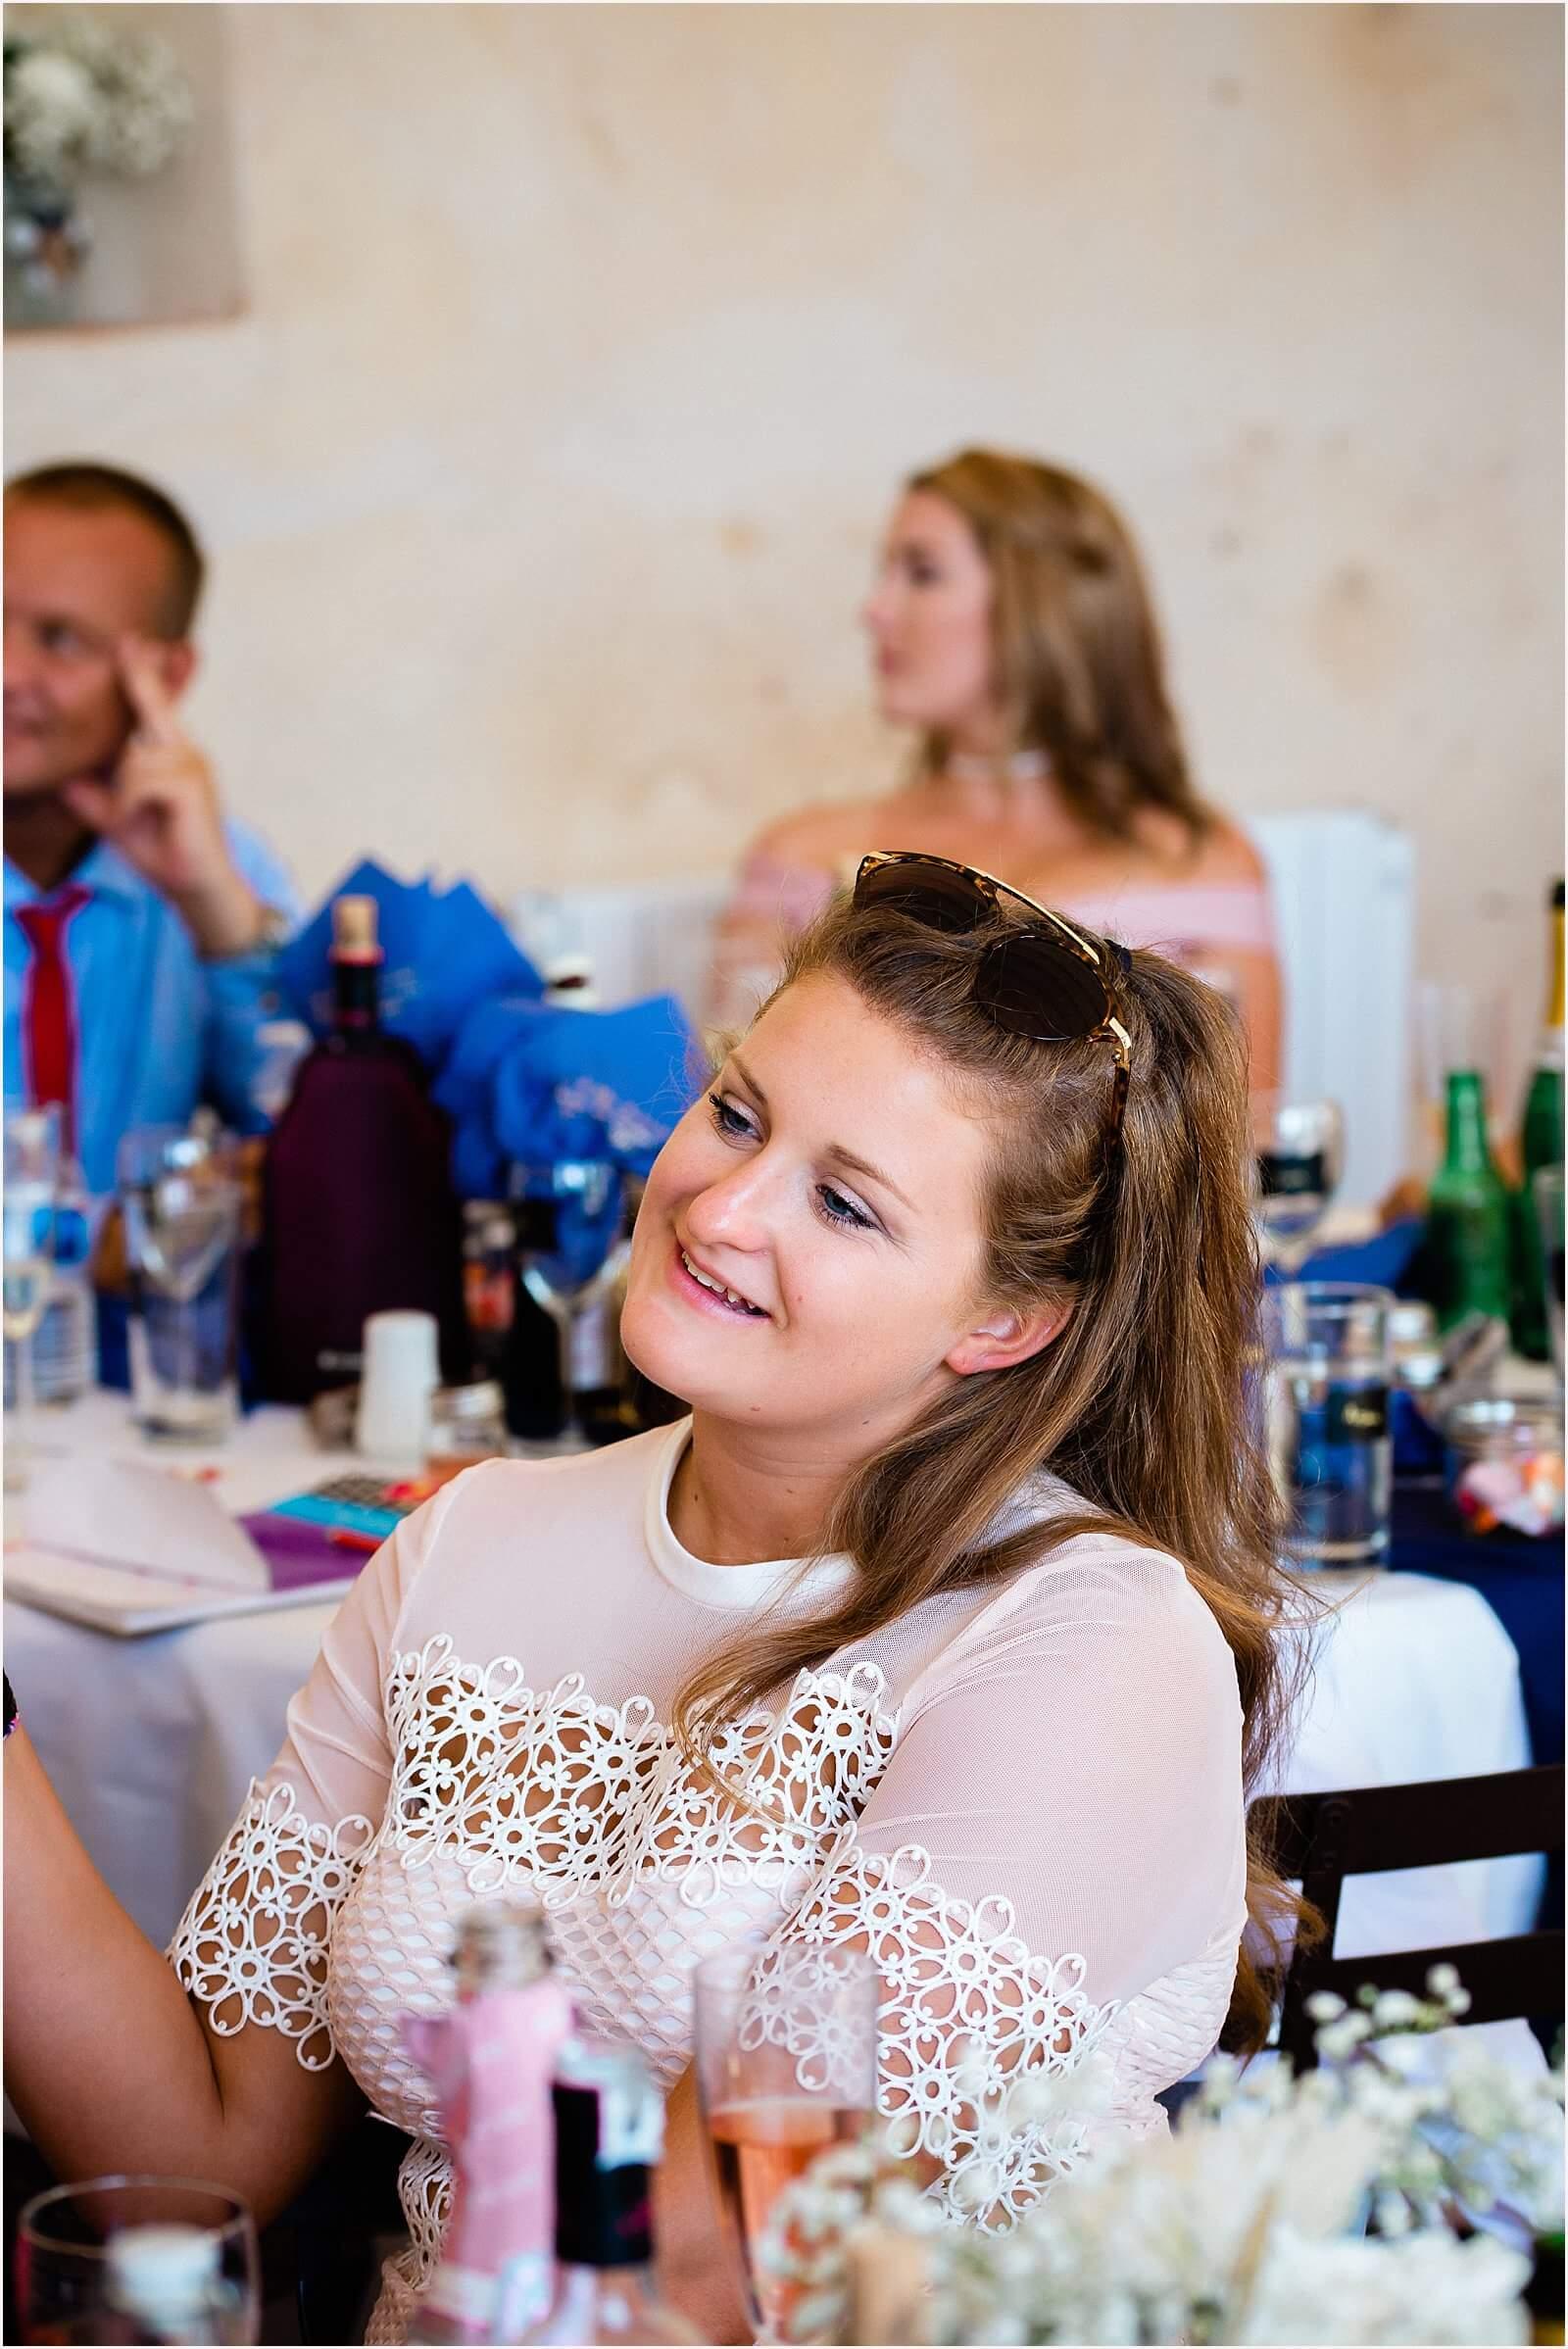 Chateau de Courtomer Wedding | Chantel & Evan 48